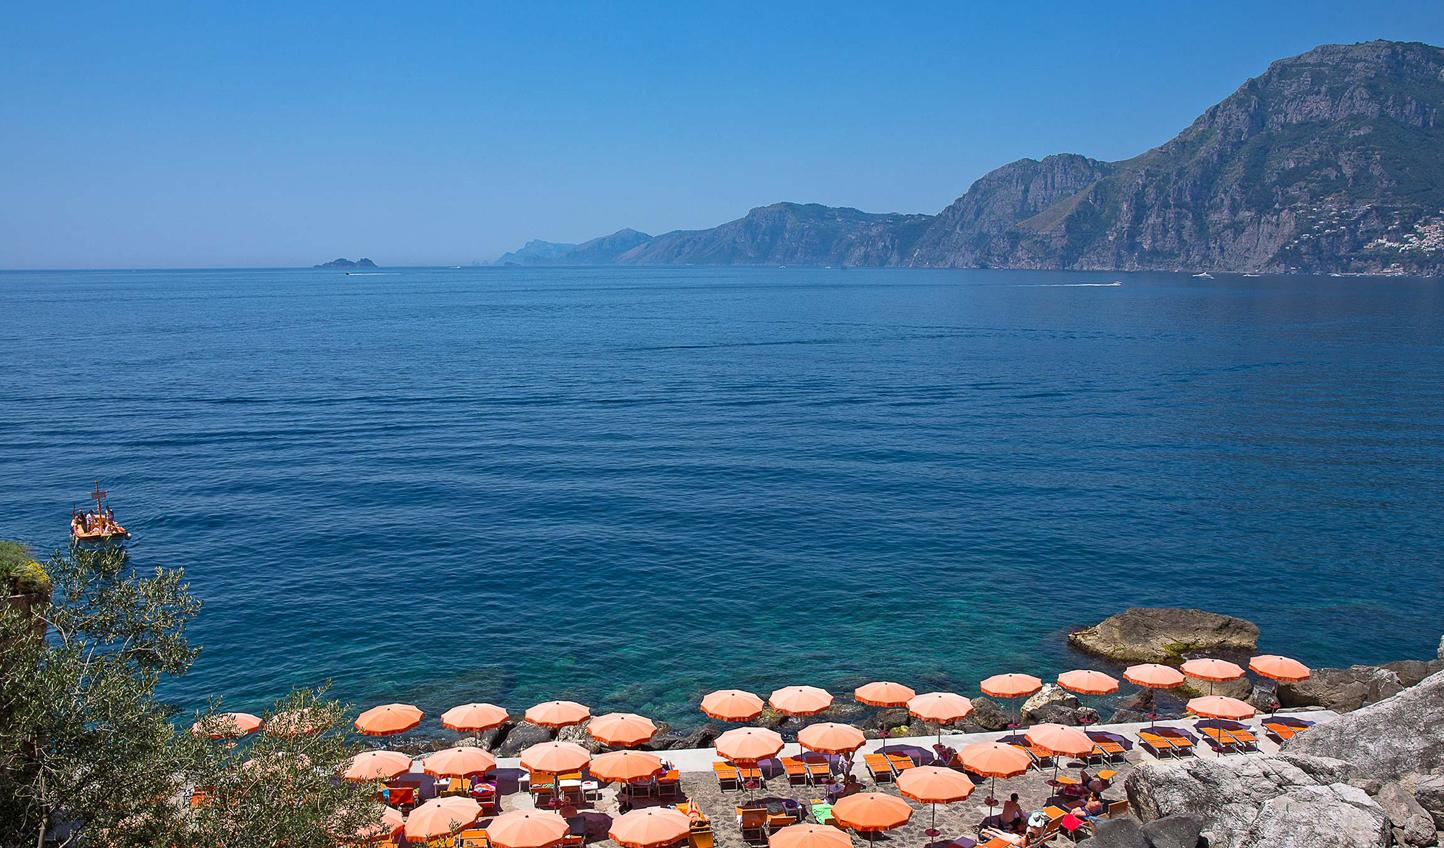 Head on down to La Gavitella Beach